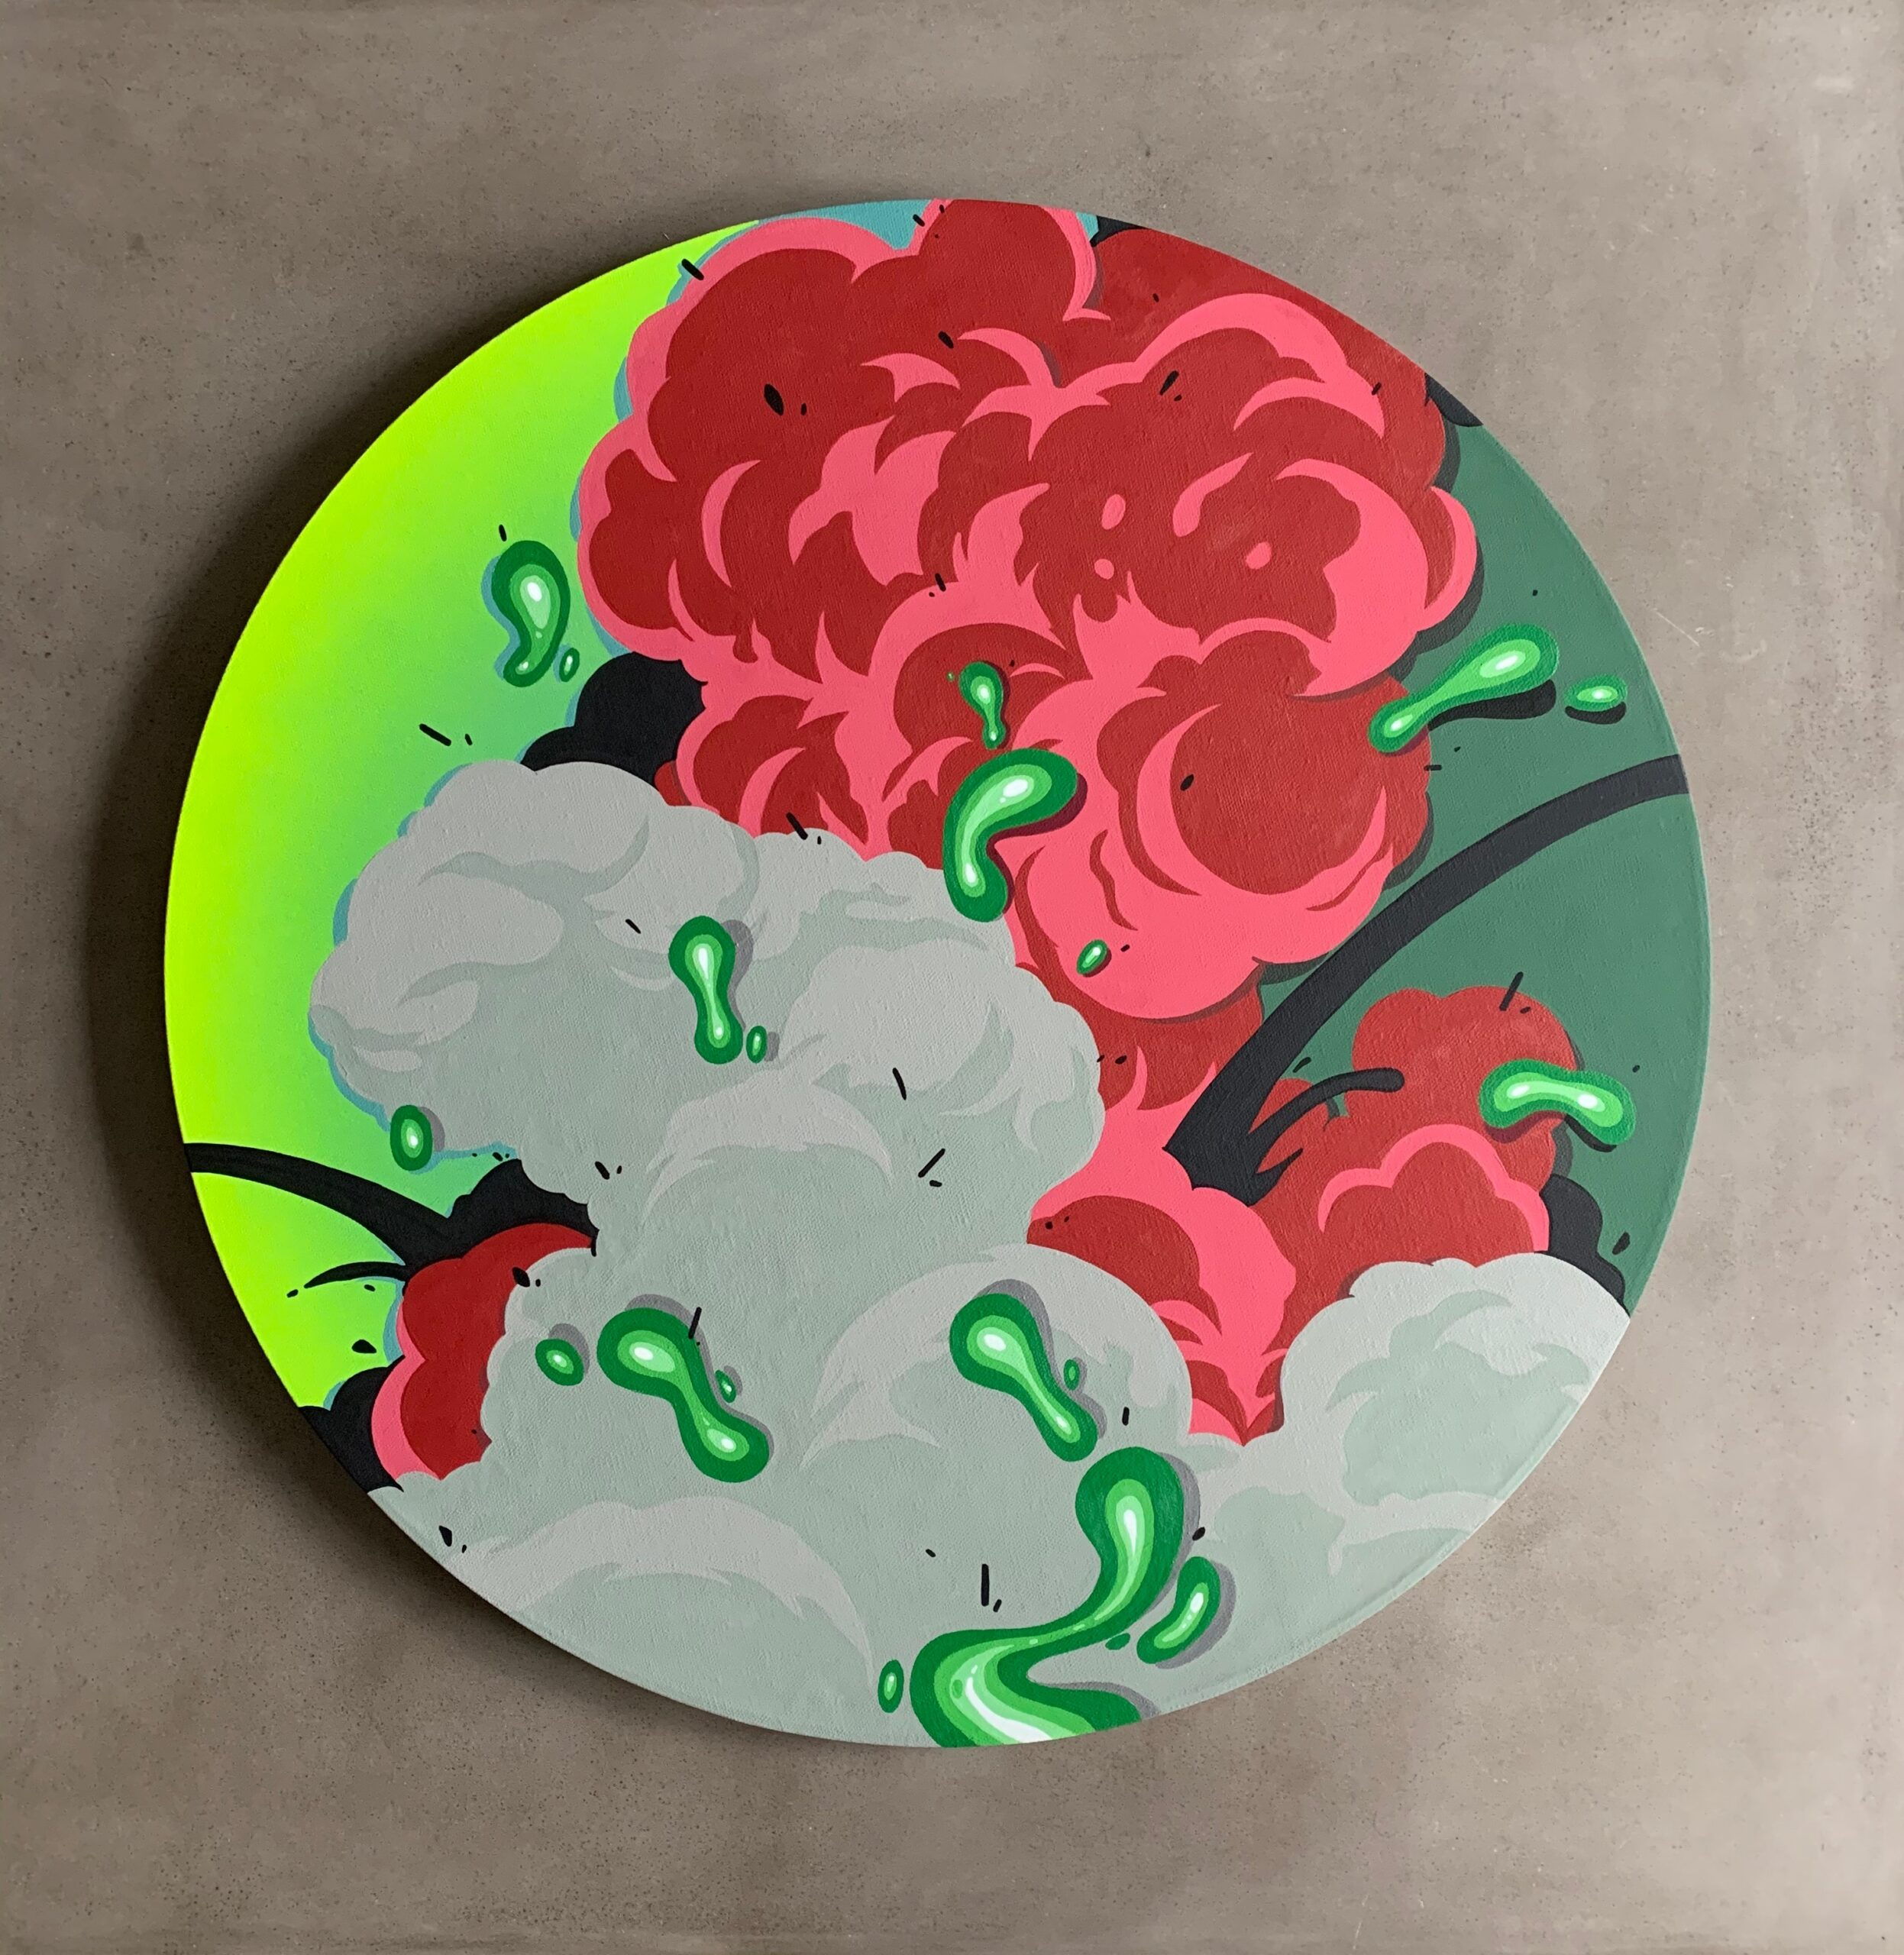 "Loom by Nover. 24"" Tondo Canvas, All Acrylic Paint, 2020."